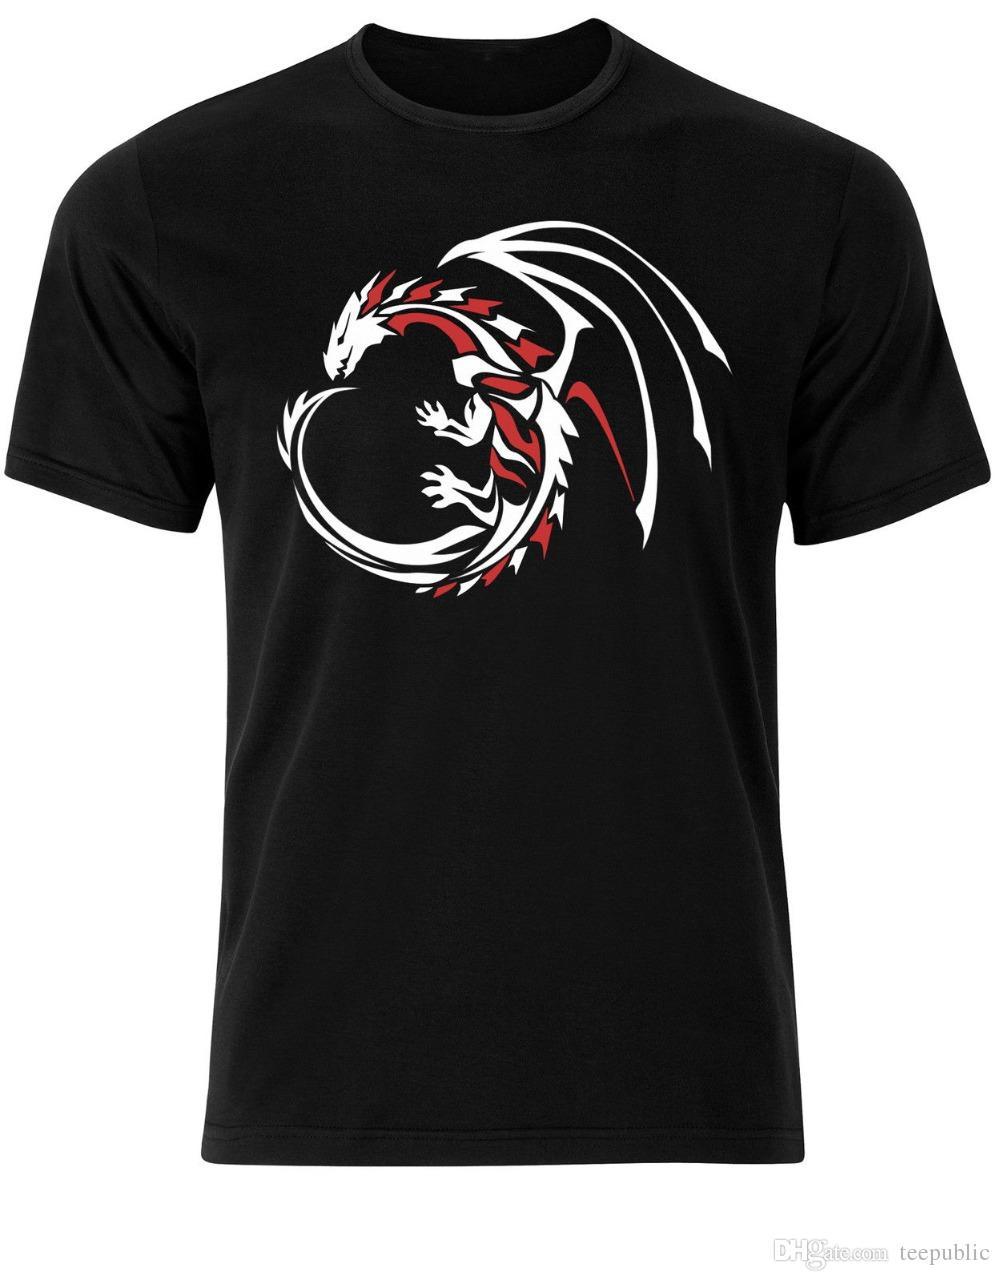 879f0678d 3D Hot Cheap Male T Shirt Men's Tribal Dragon Drake Wyrm Tattoo Design Mens  Tshirt Tee Top AE62 Crew Neck Design Short Sleeve